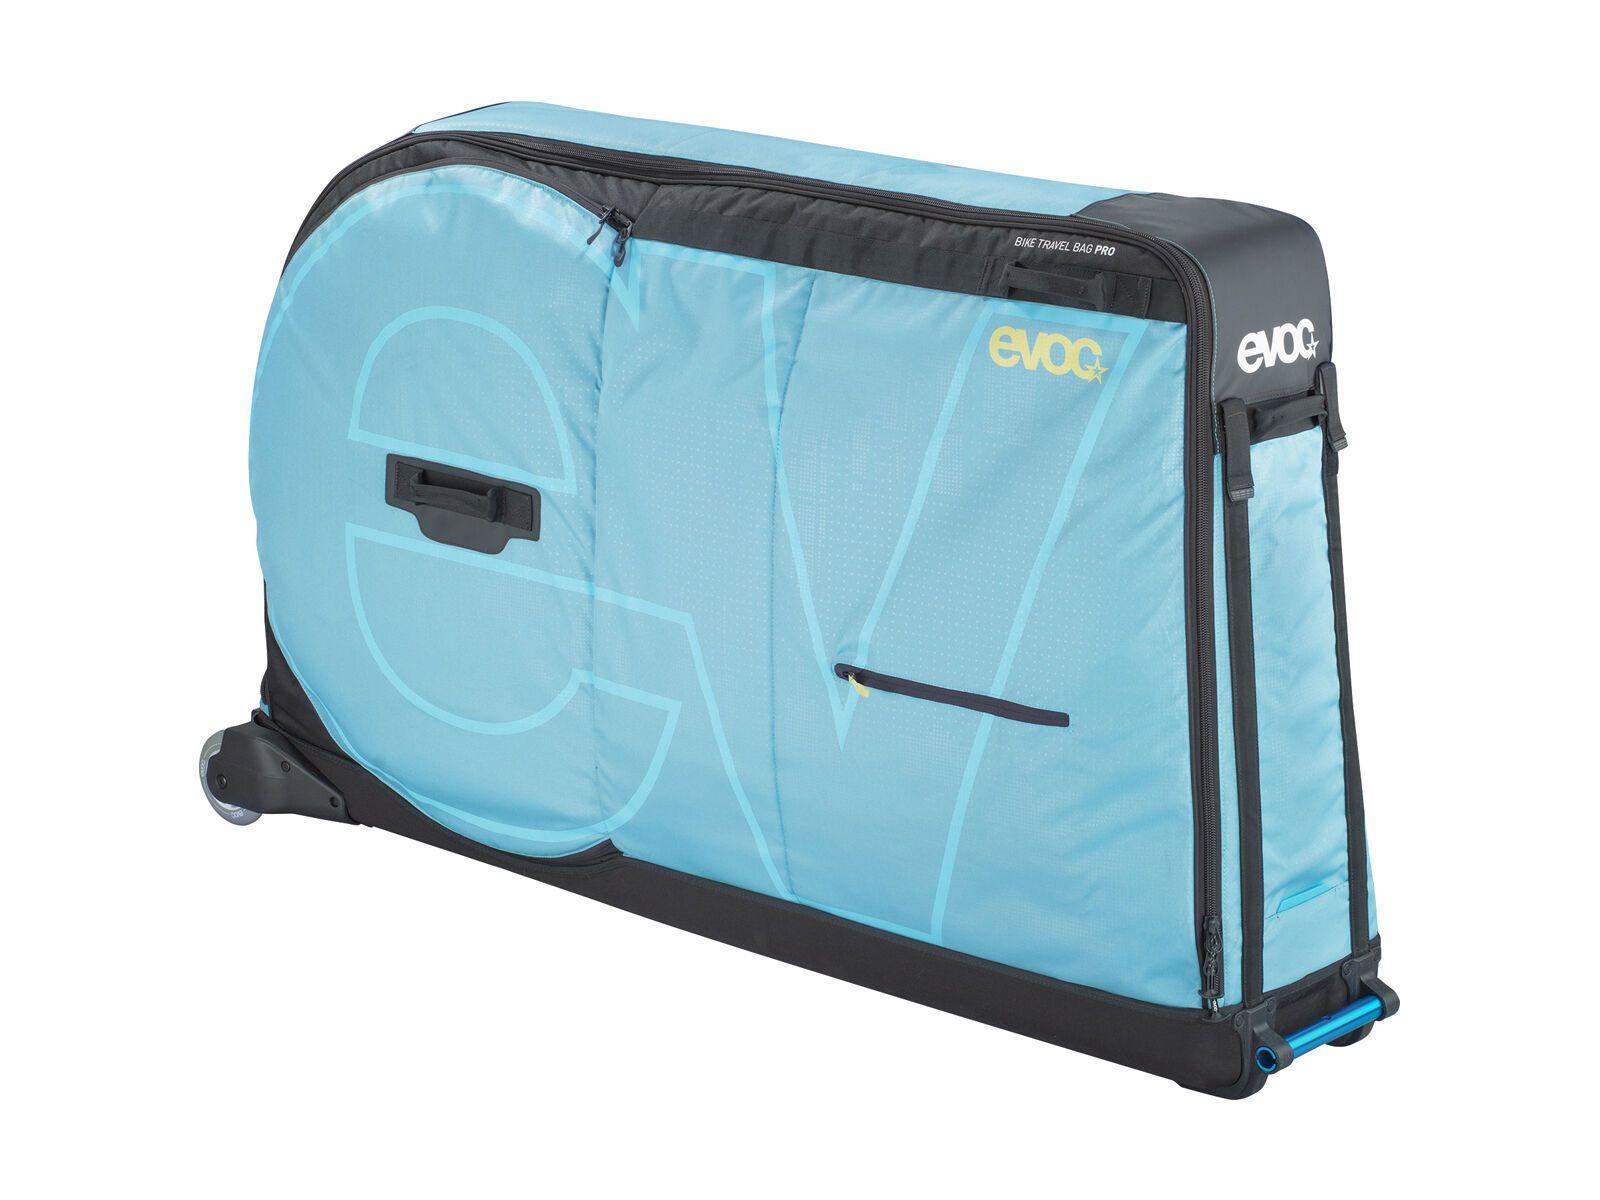 Evoc Bike Travel Bag Pro 310l, aqua blue - Fahrradtransporttasche 450721000